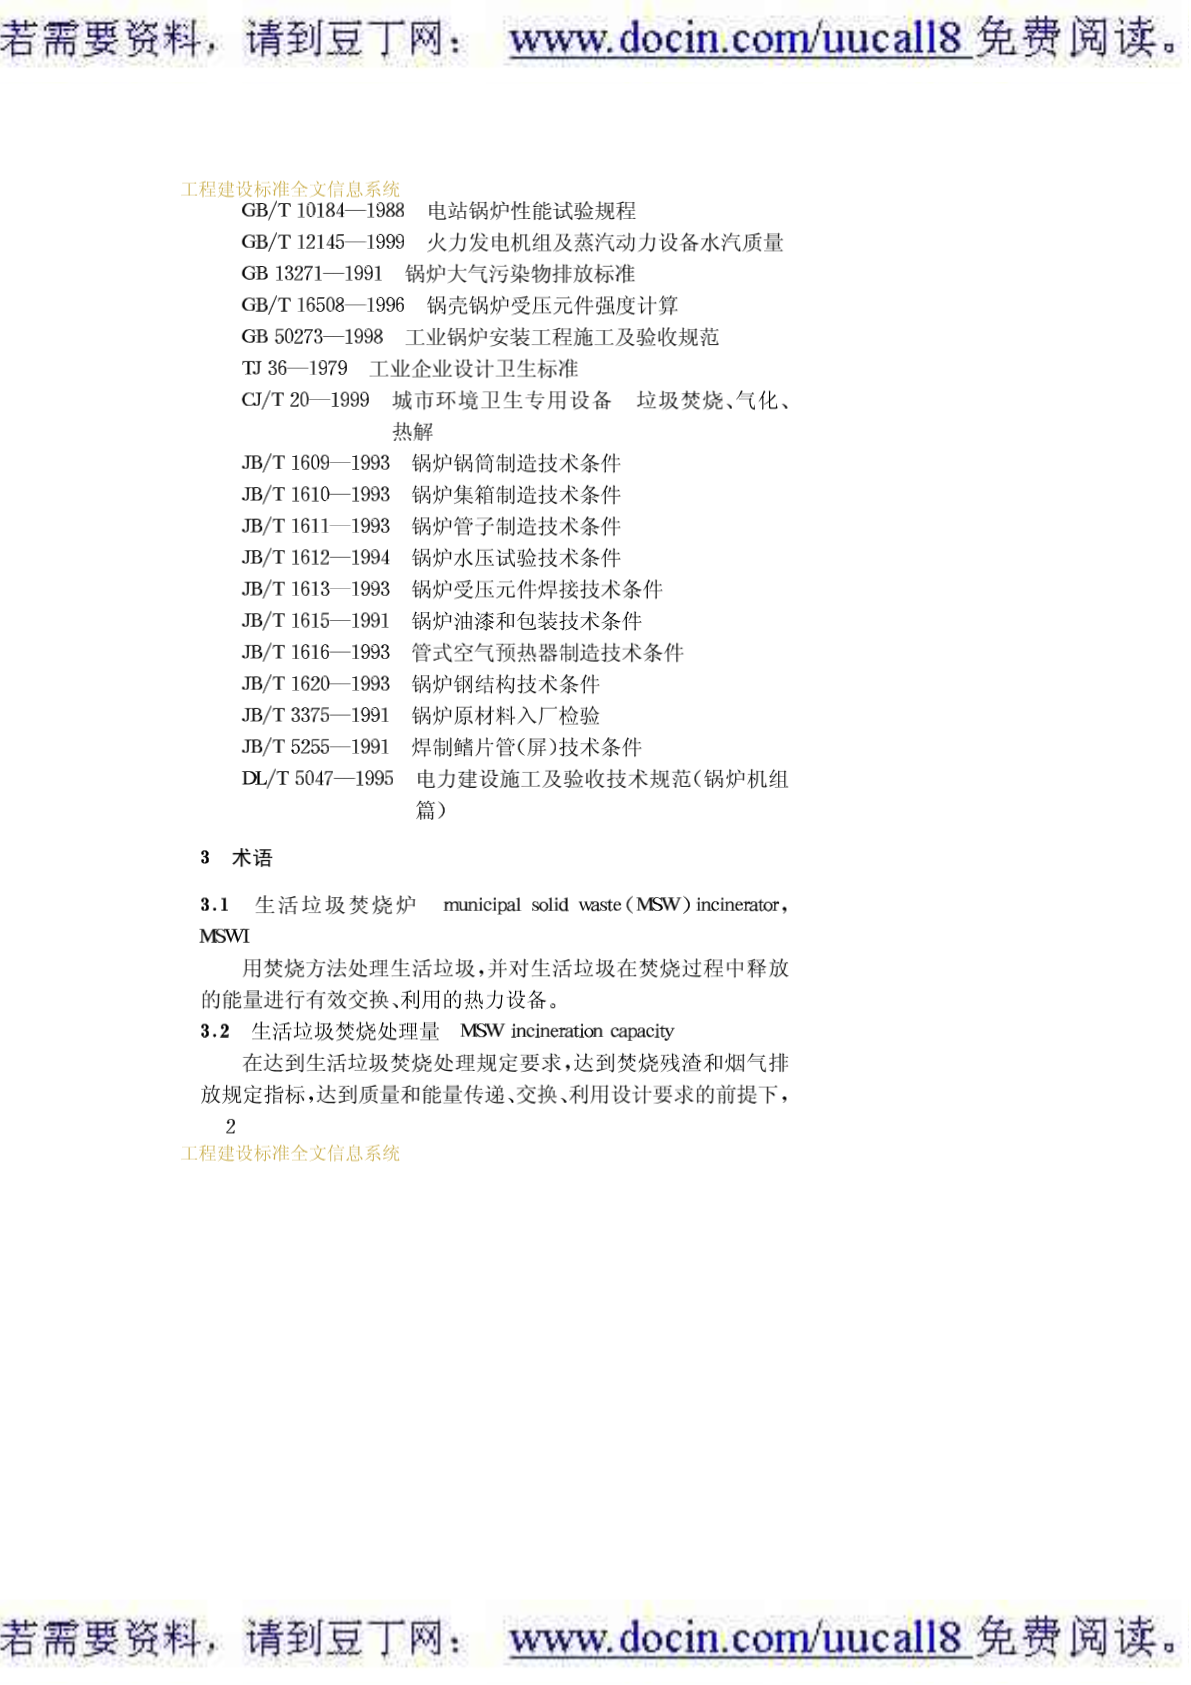 CJ城建标准大全CJT 118-2000 生活垃圾焚烧炉-图一